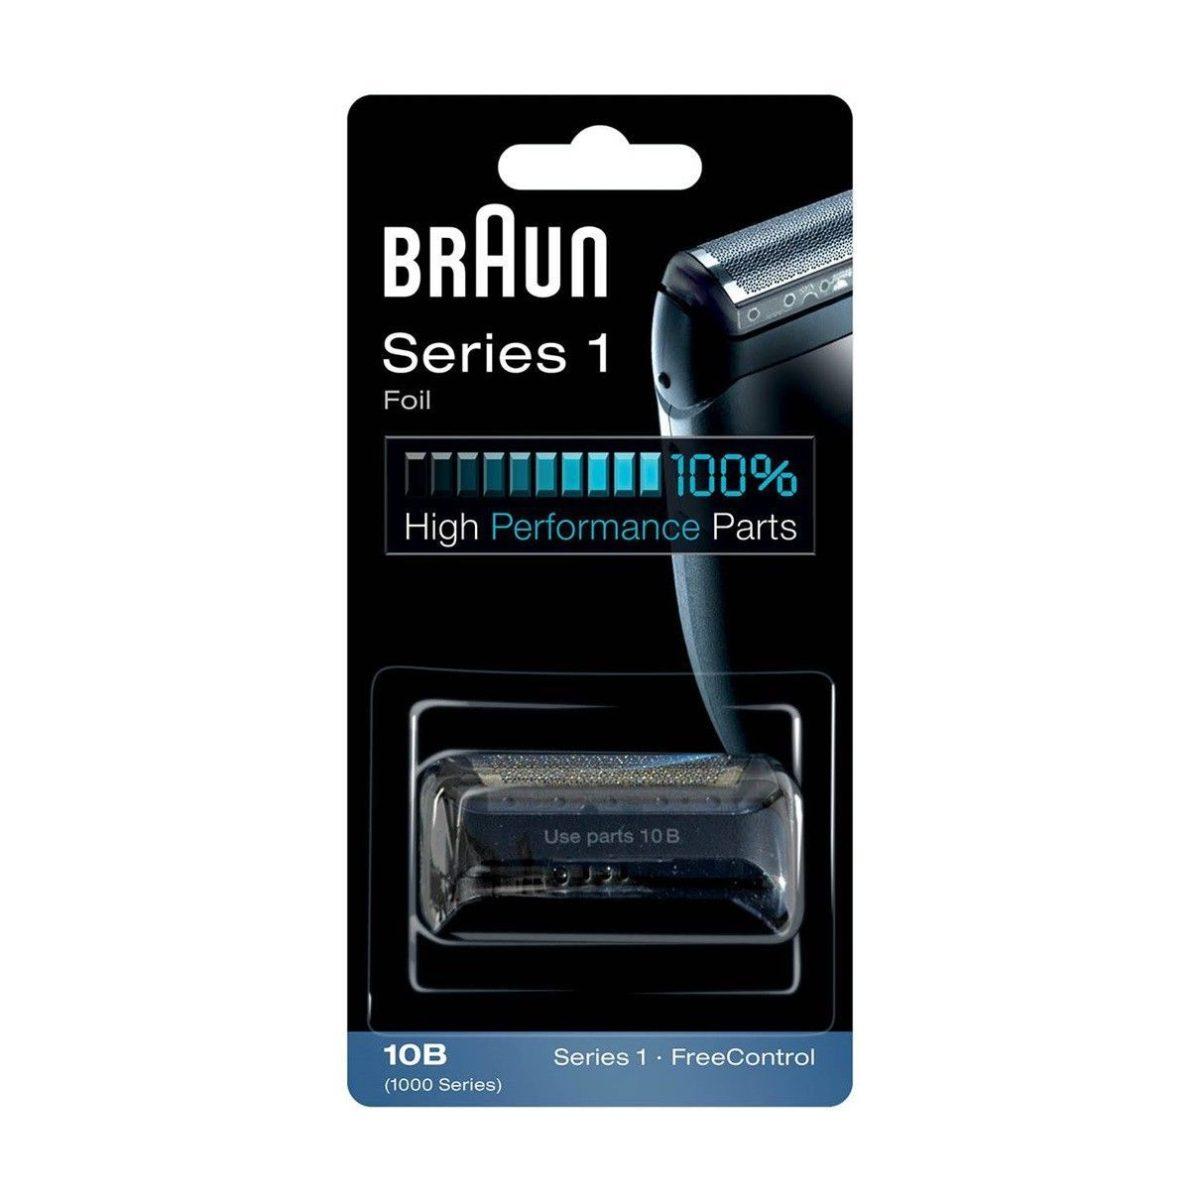 Cabezal Afeitadora Braun 10B series 1 freecontrol